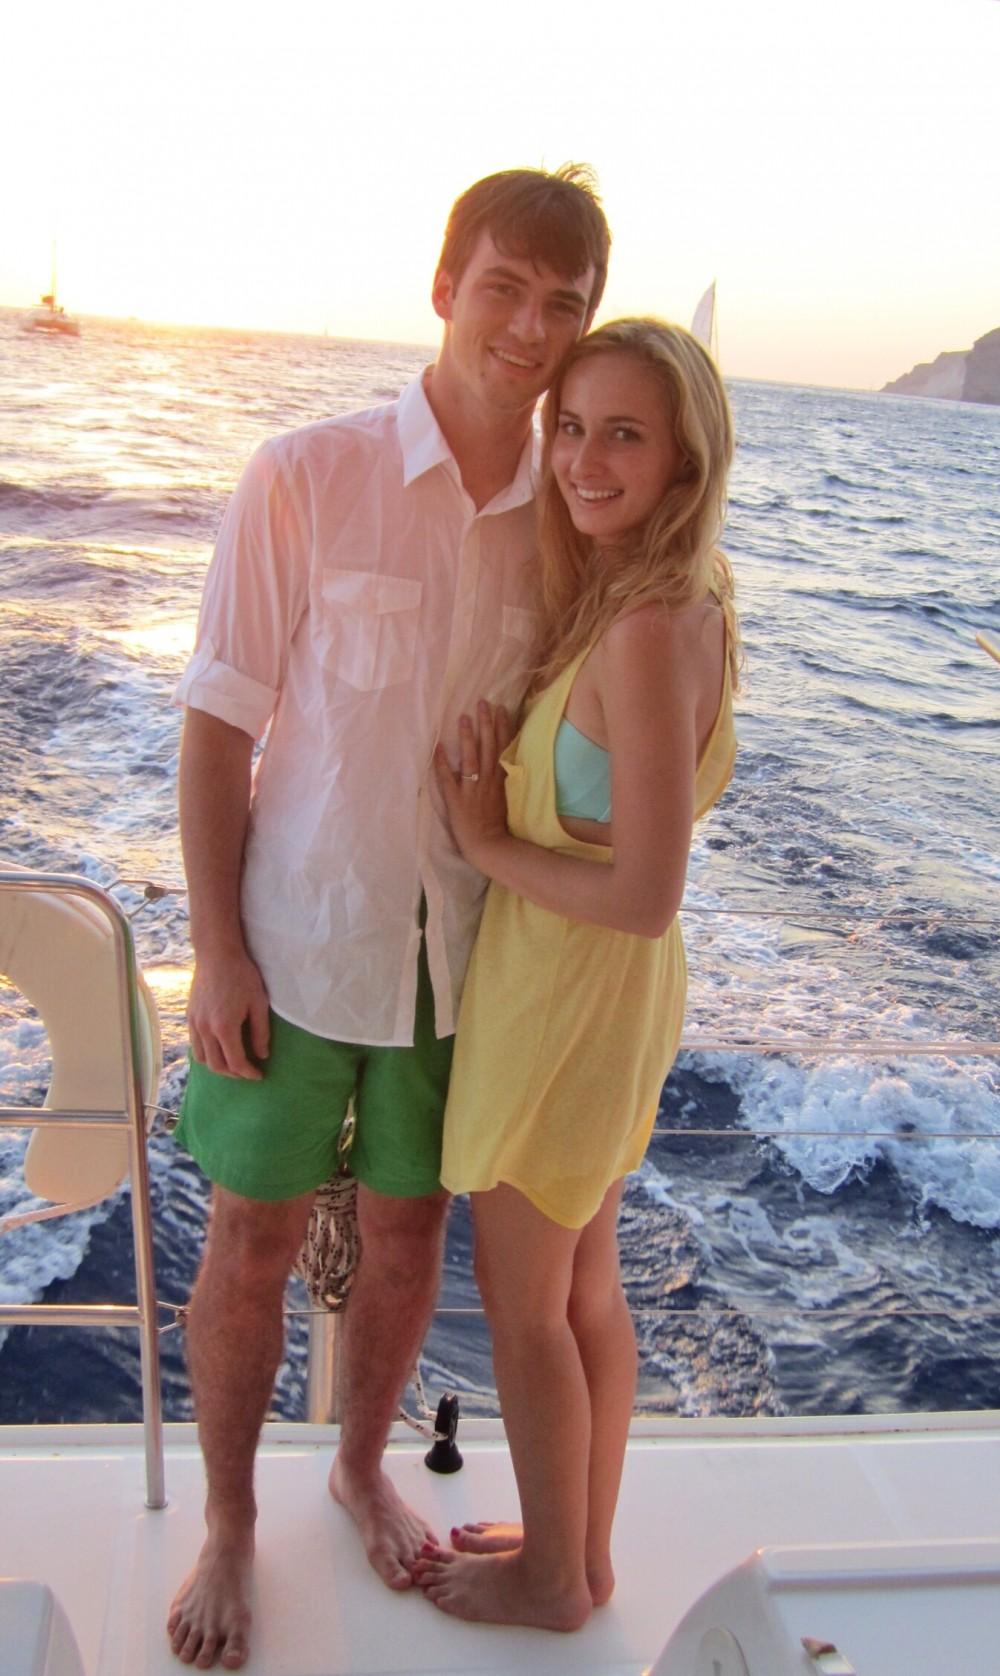 Image 1 of Katherine and Michael